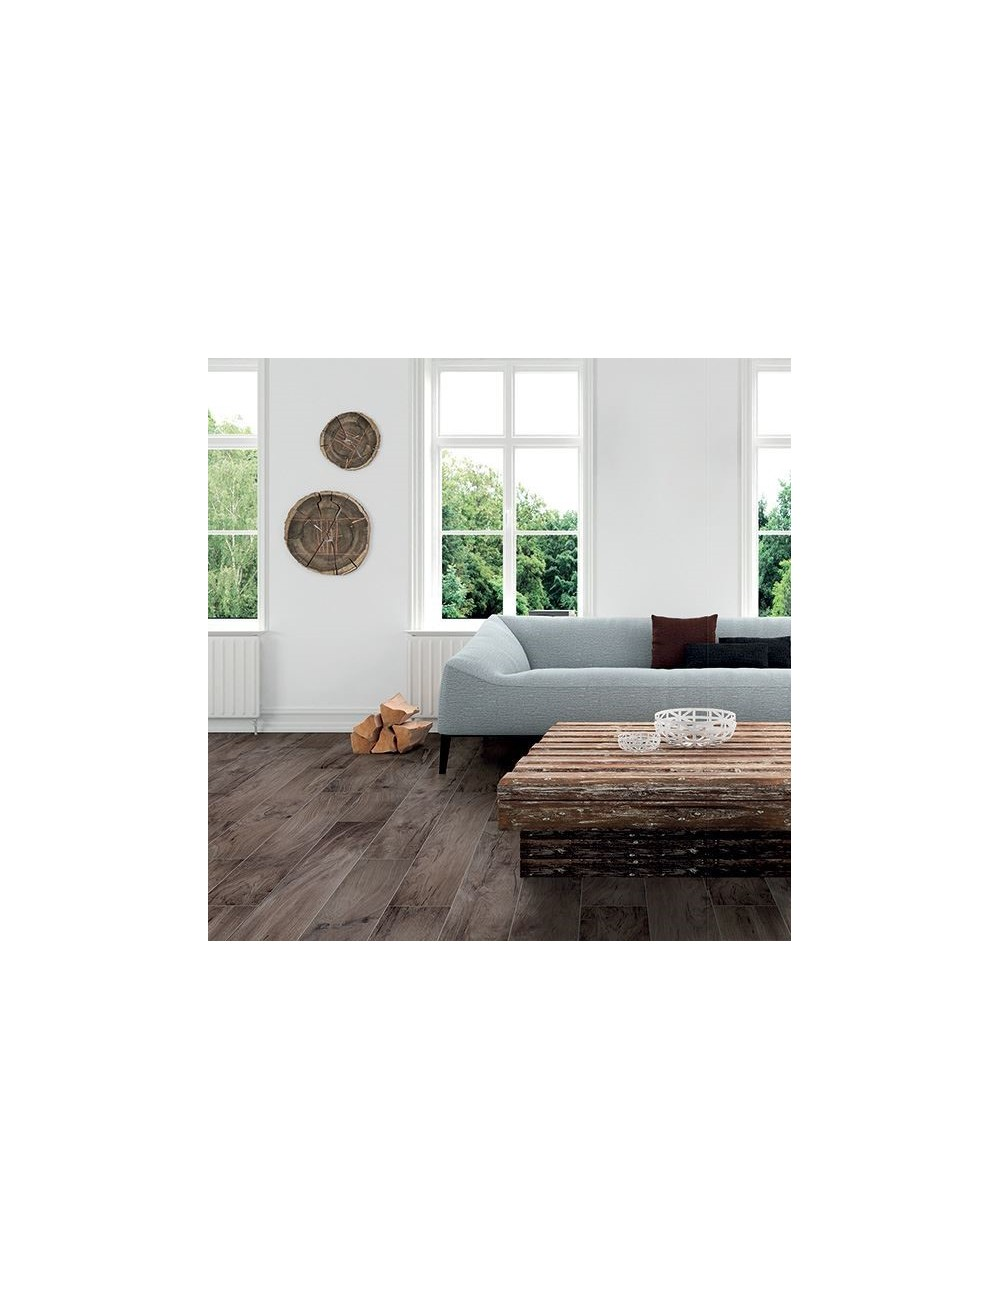 Fuga Minima Pavimento Rettificato bark root